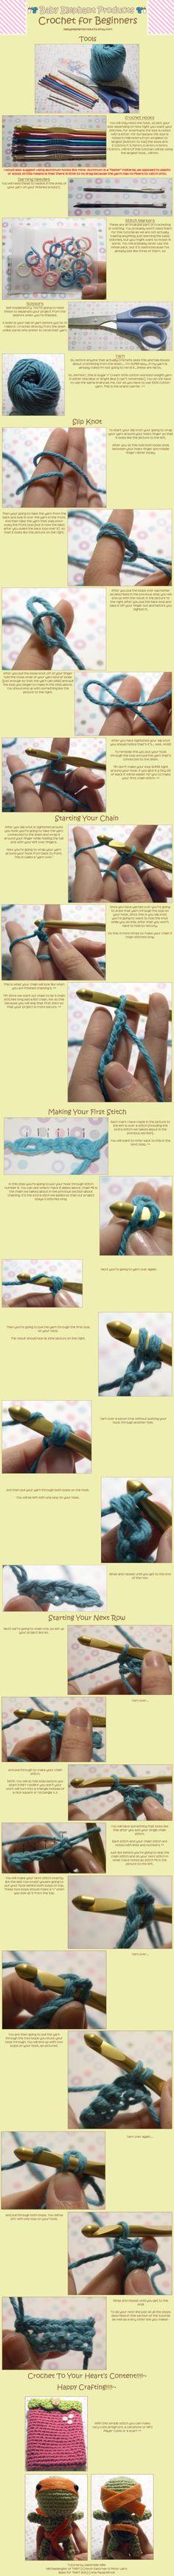 Beginners Crochet Tutorial by =moofestgirl on deviantART